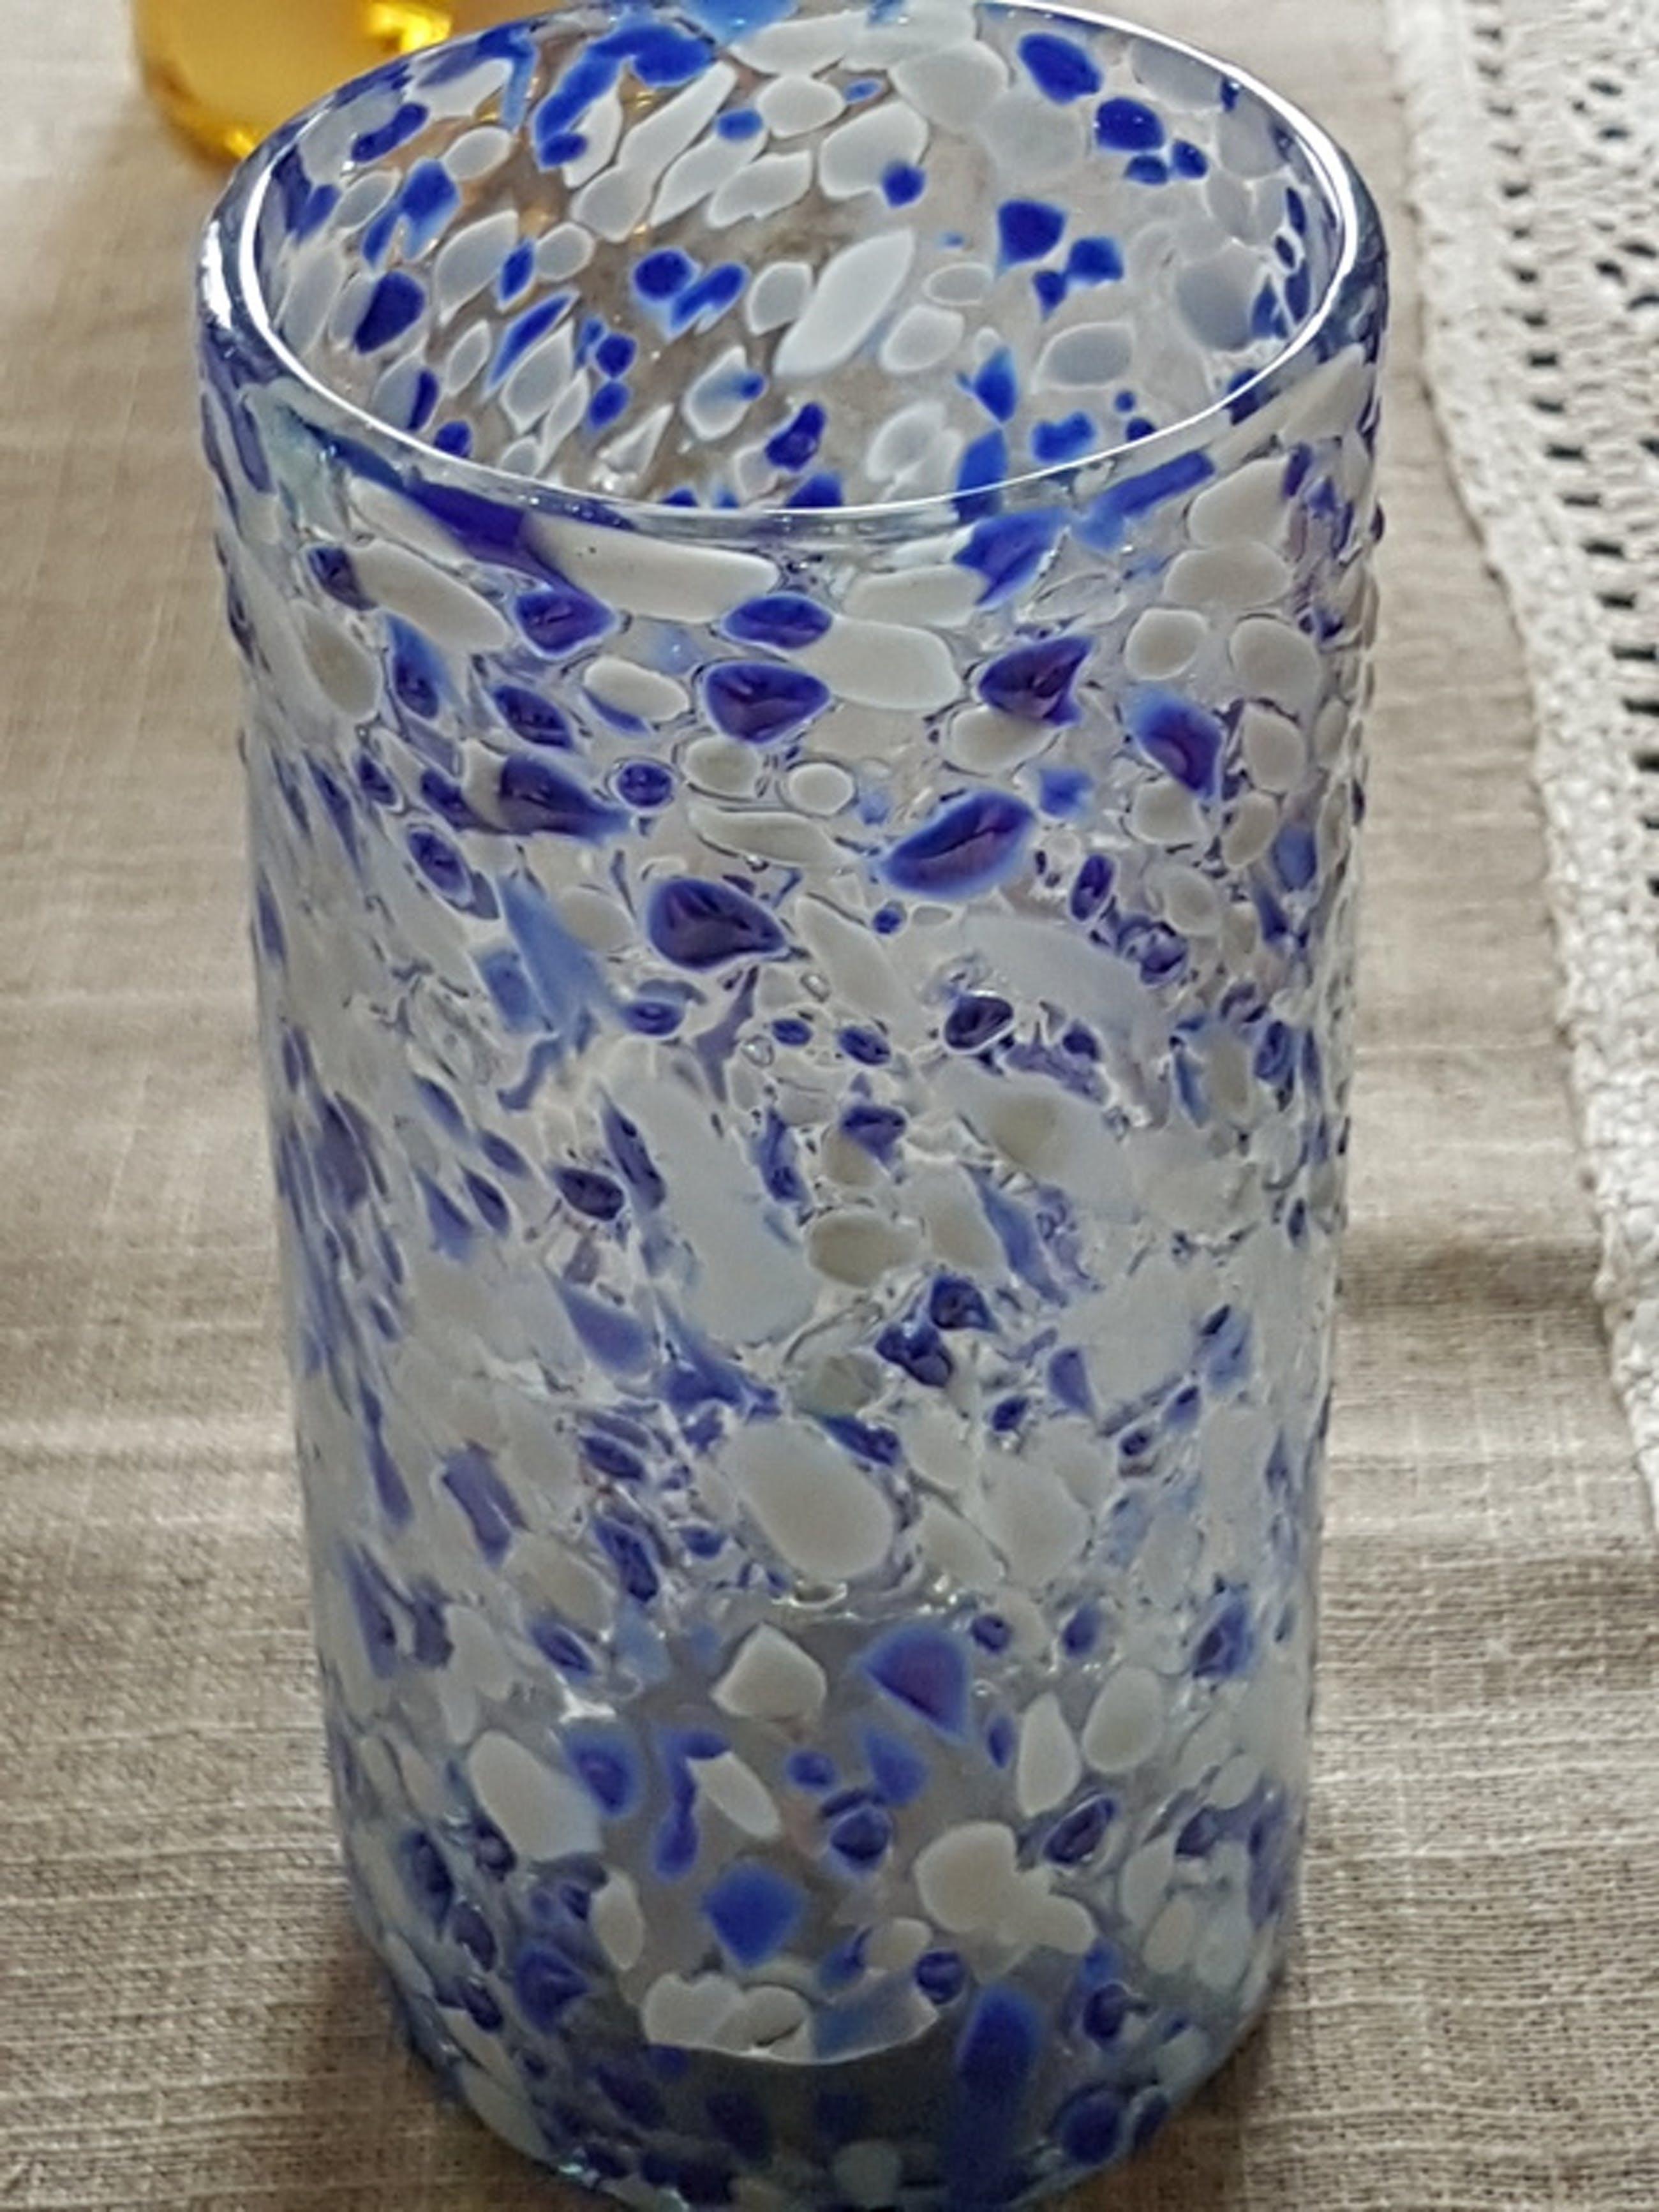 Blu cobalto-Venezia-Pulegoso glas-vaas H 18 cm x 8 cm kopen? Bied vanaf 1!